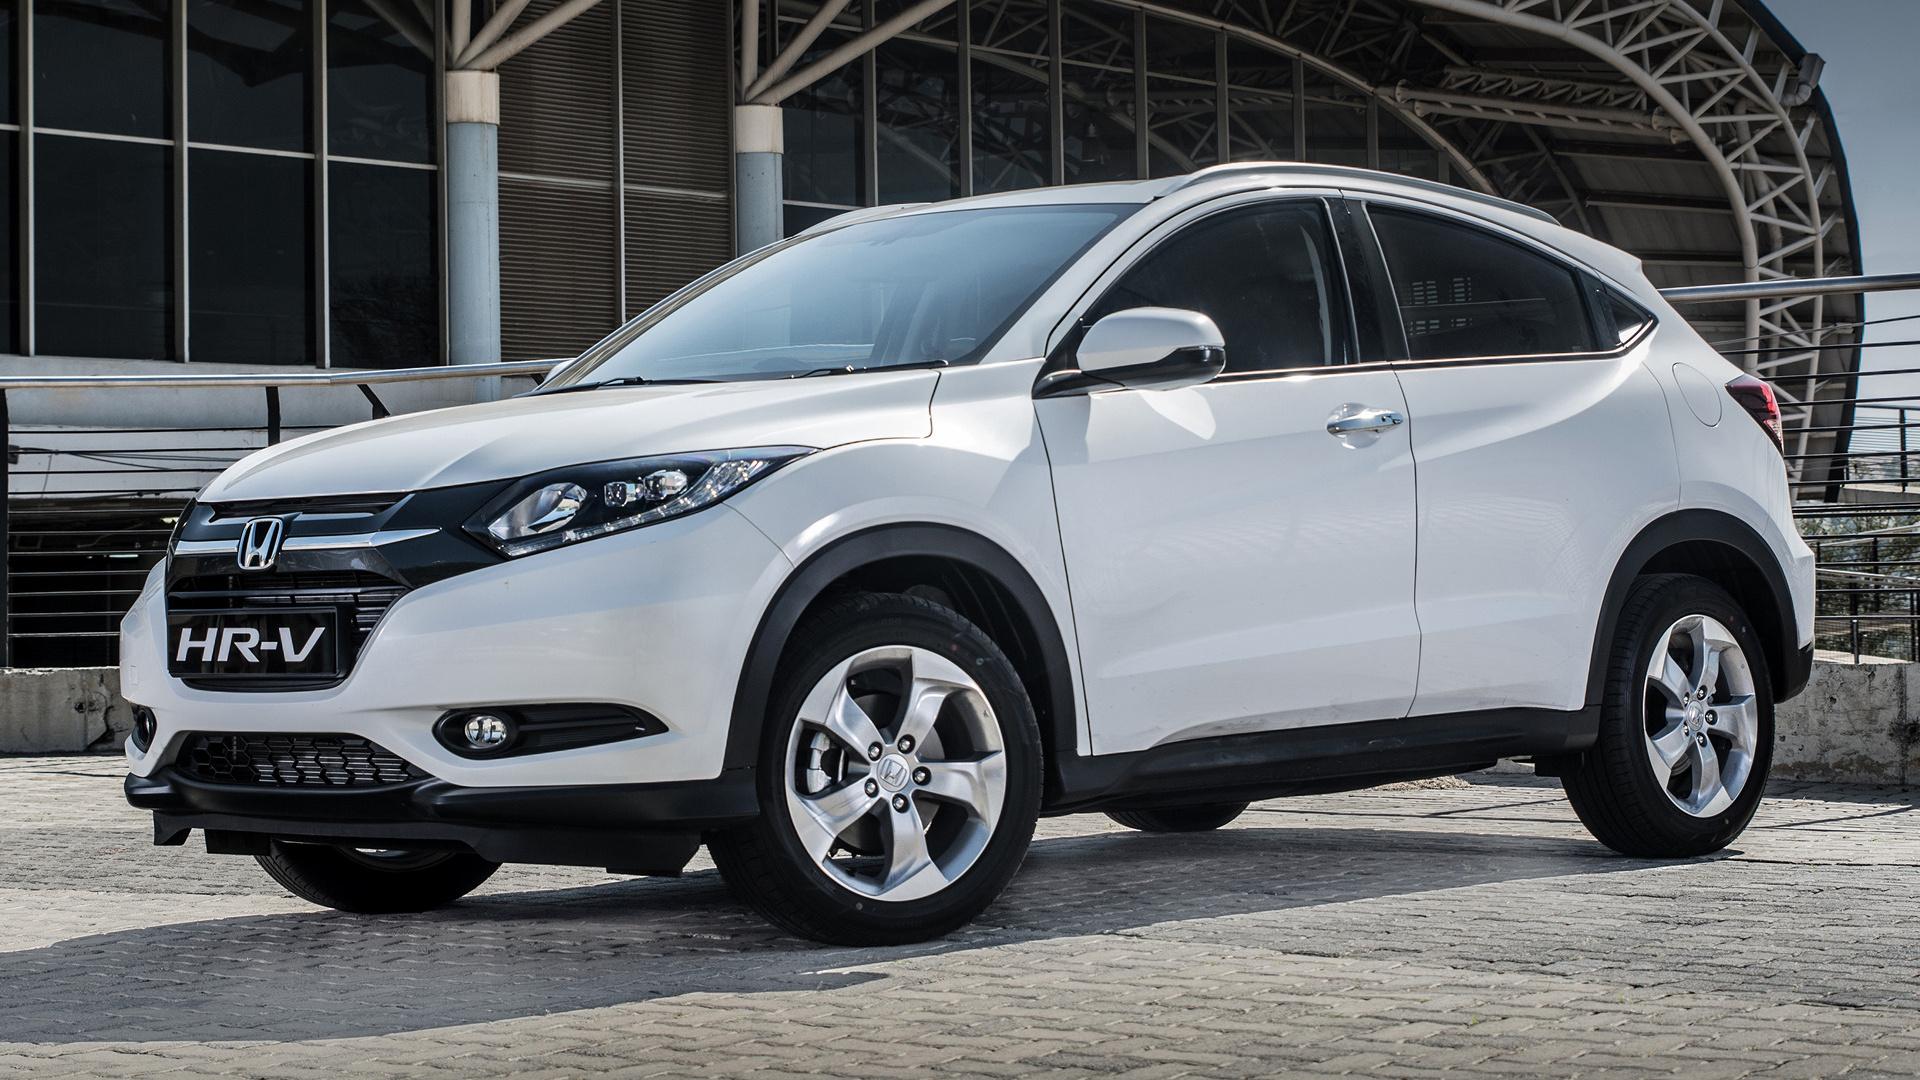 2015 Honda HR-V (ZA) - Wallpapers and HD Images | Car Pixel